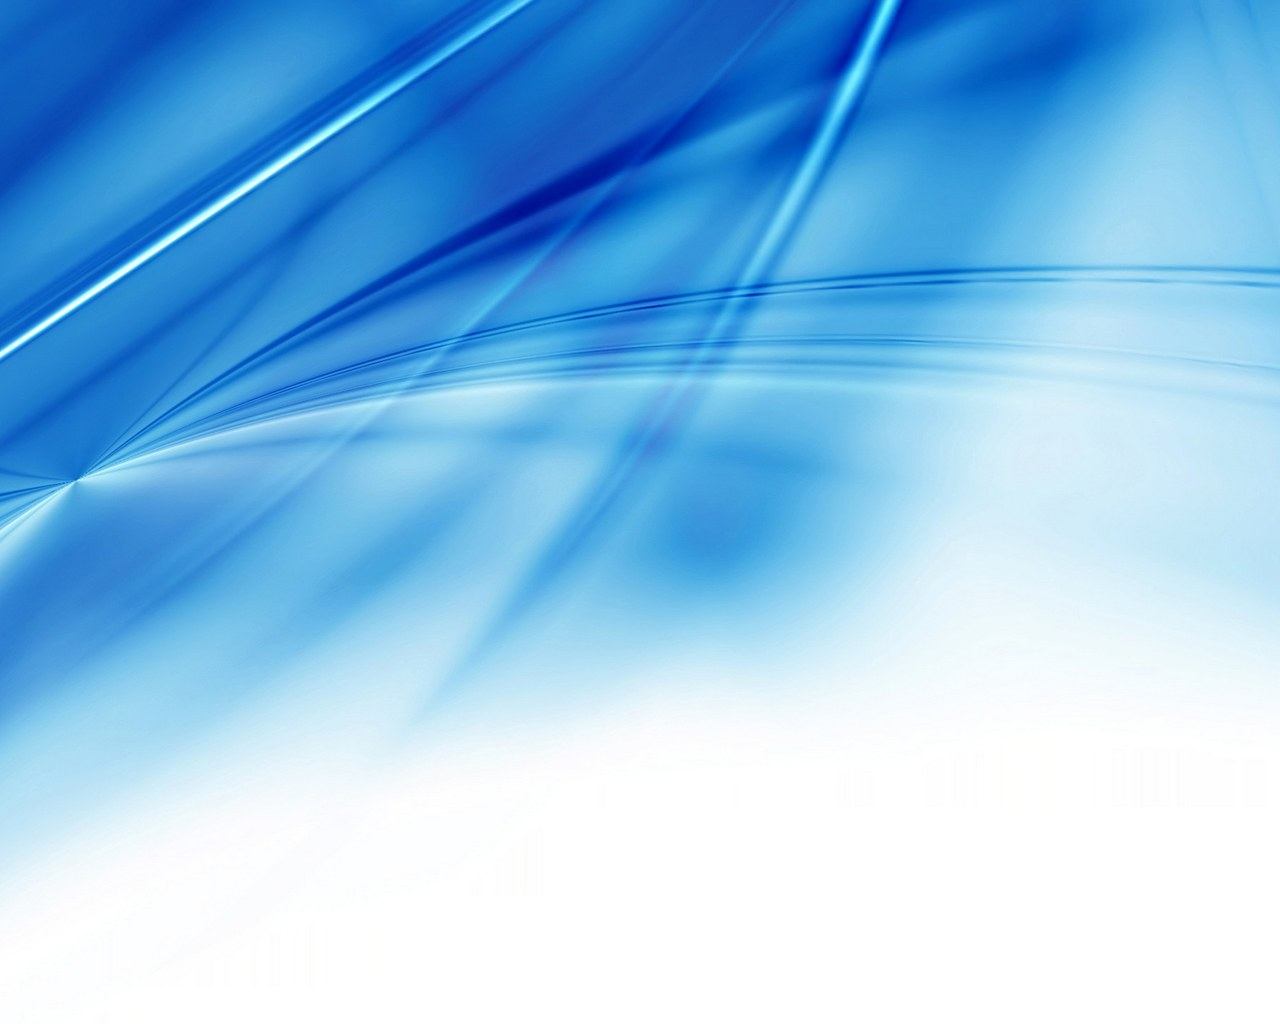 Blue Background   Blue Abstract Light Effect 12801024 NO42 Wallpaper 1280x1024